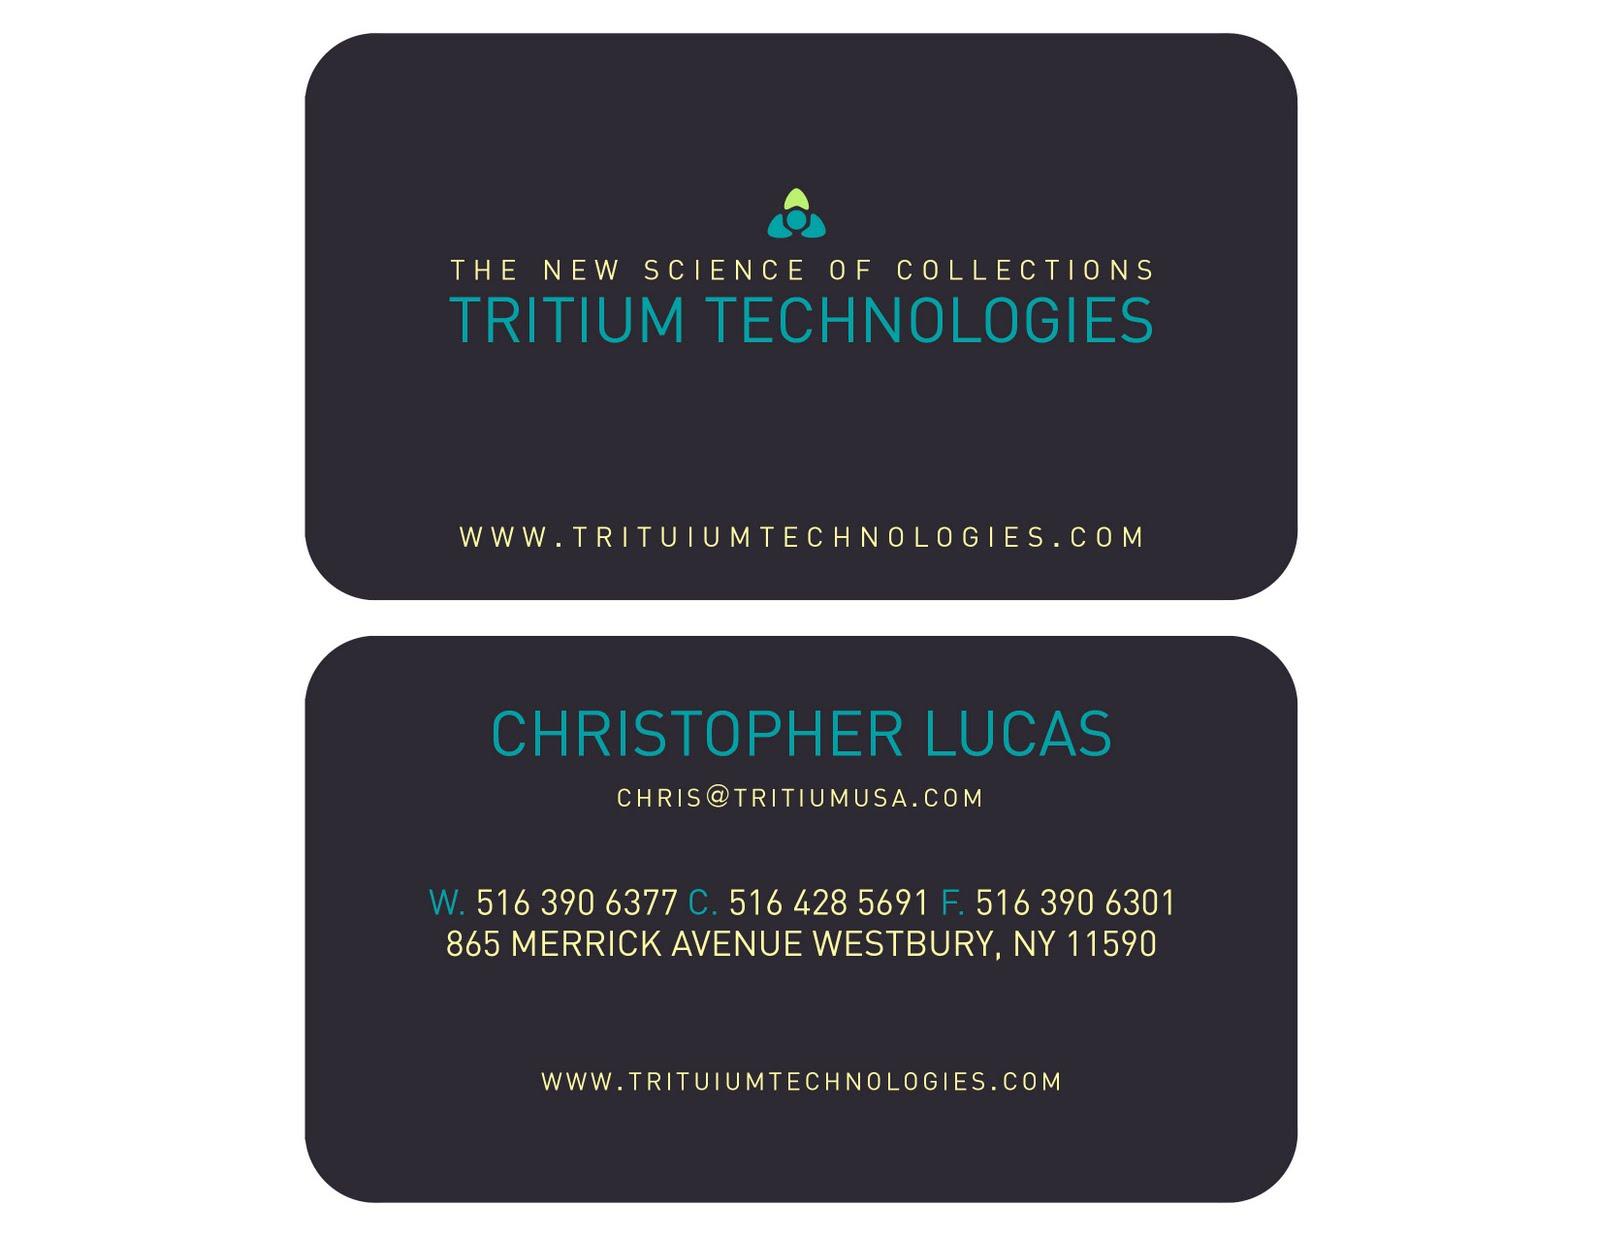 Christine orlando business card design print 35 x 2 typeface century gothic 2012 tritium card services colourmoves